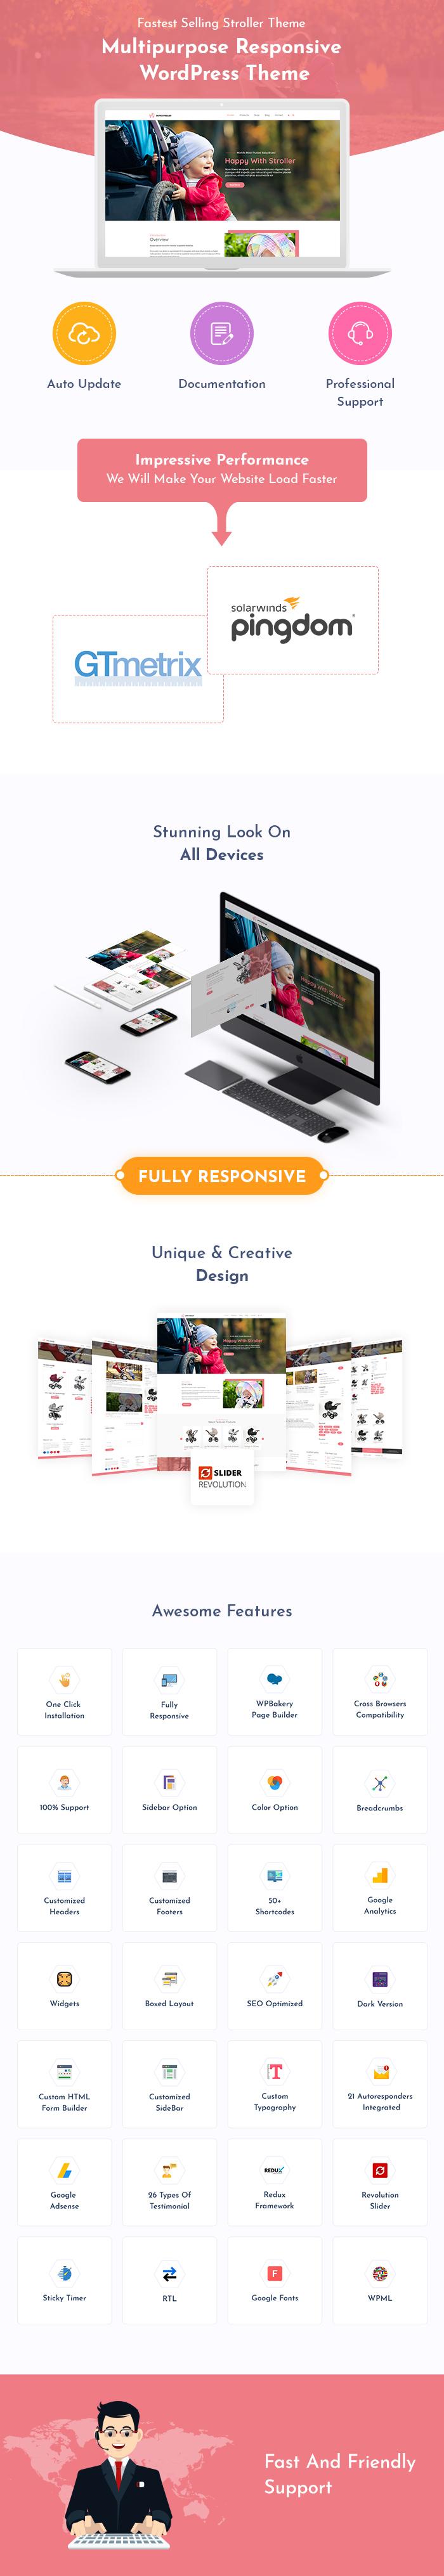 Stroller WordPress Themes